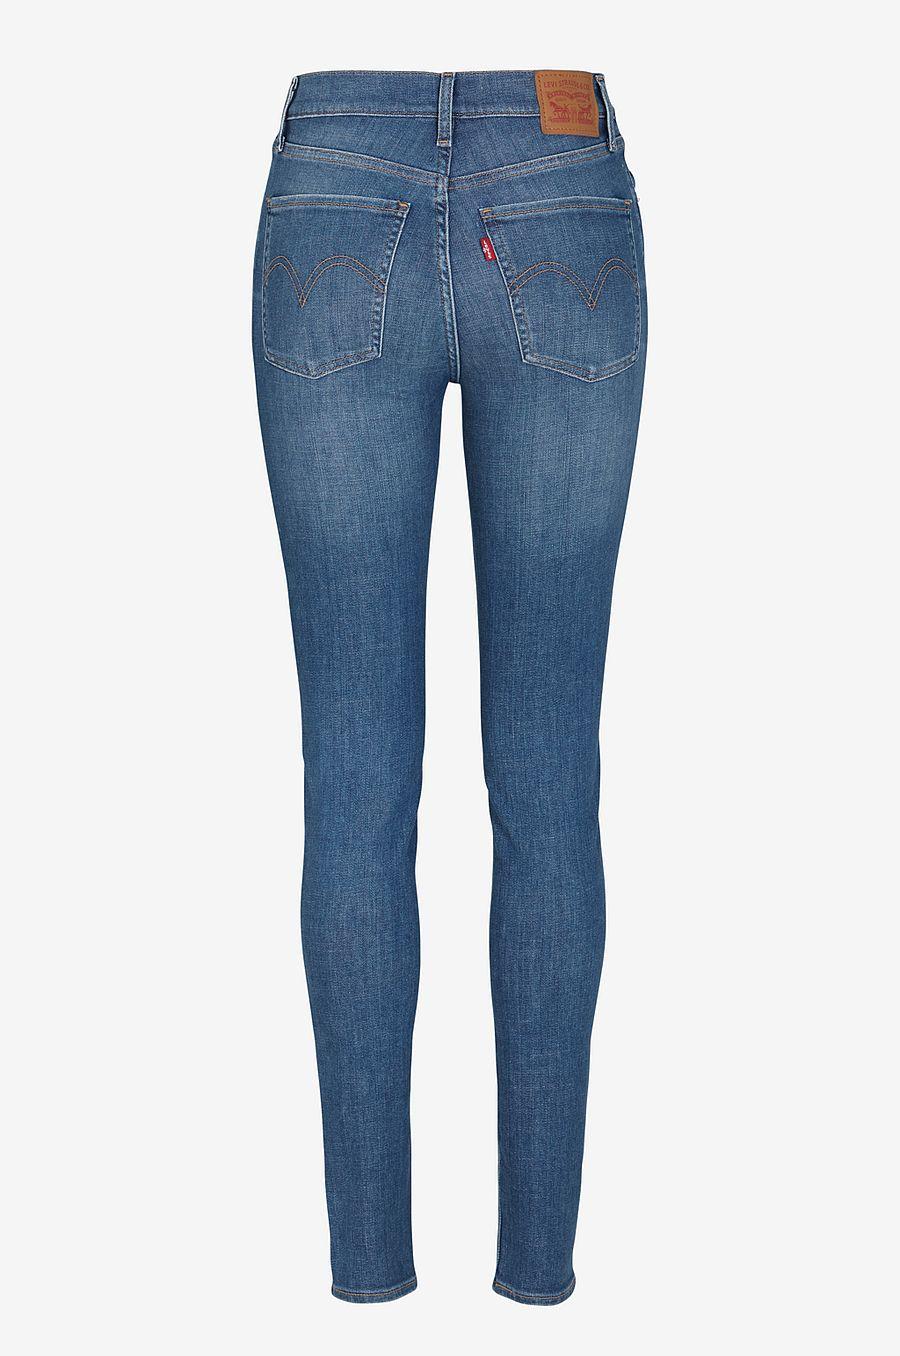 levis jeans dam hög midja